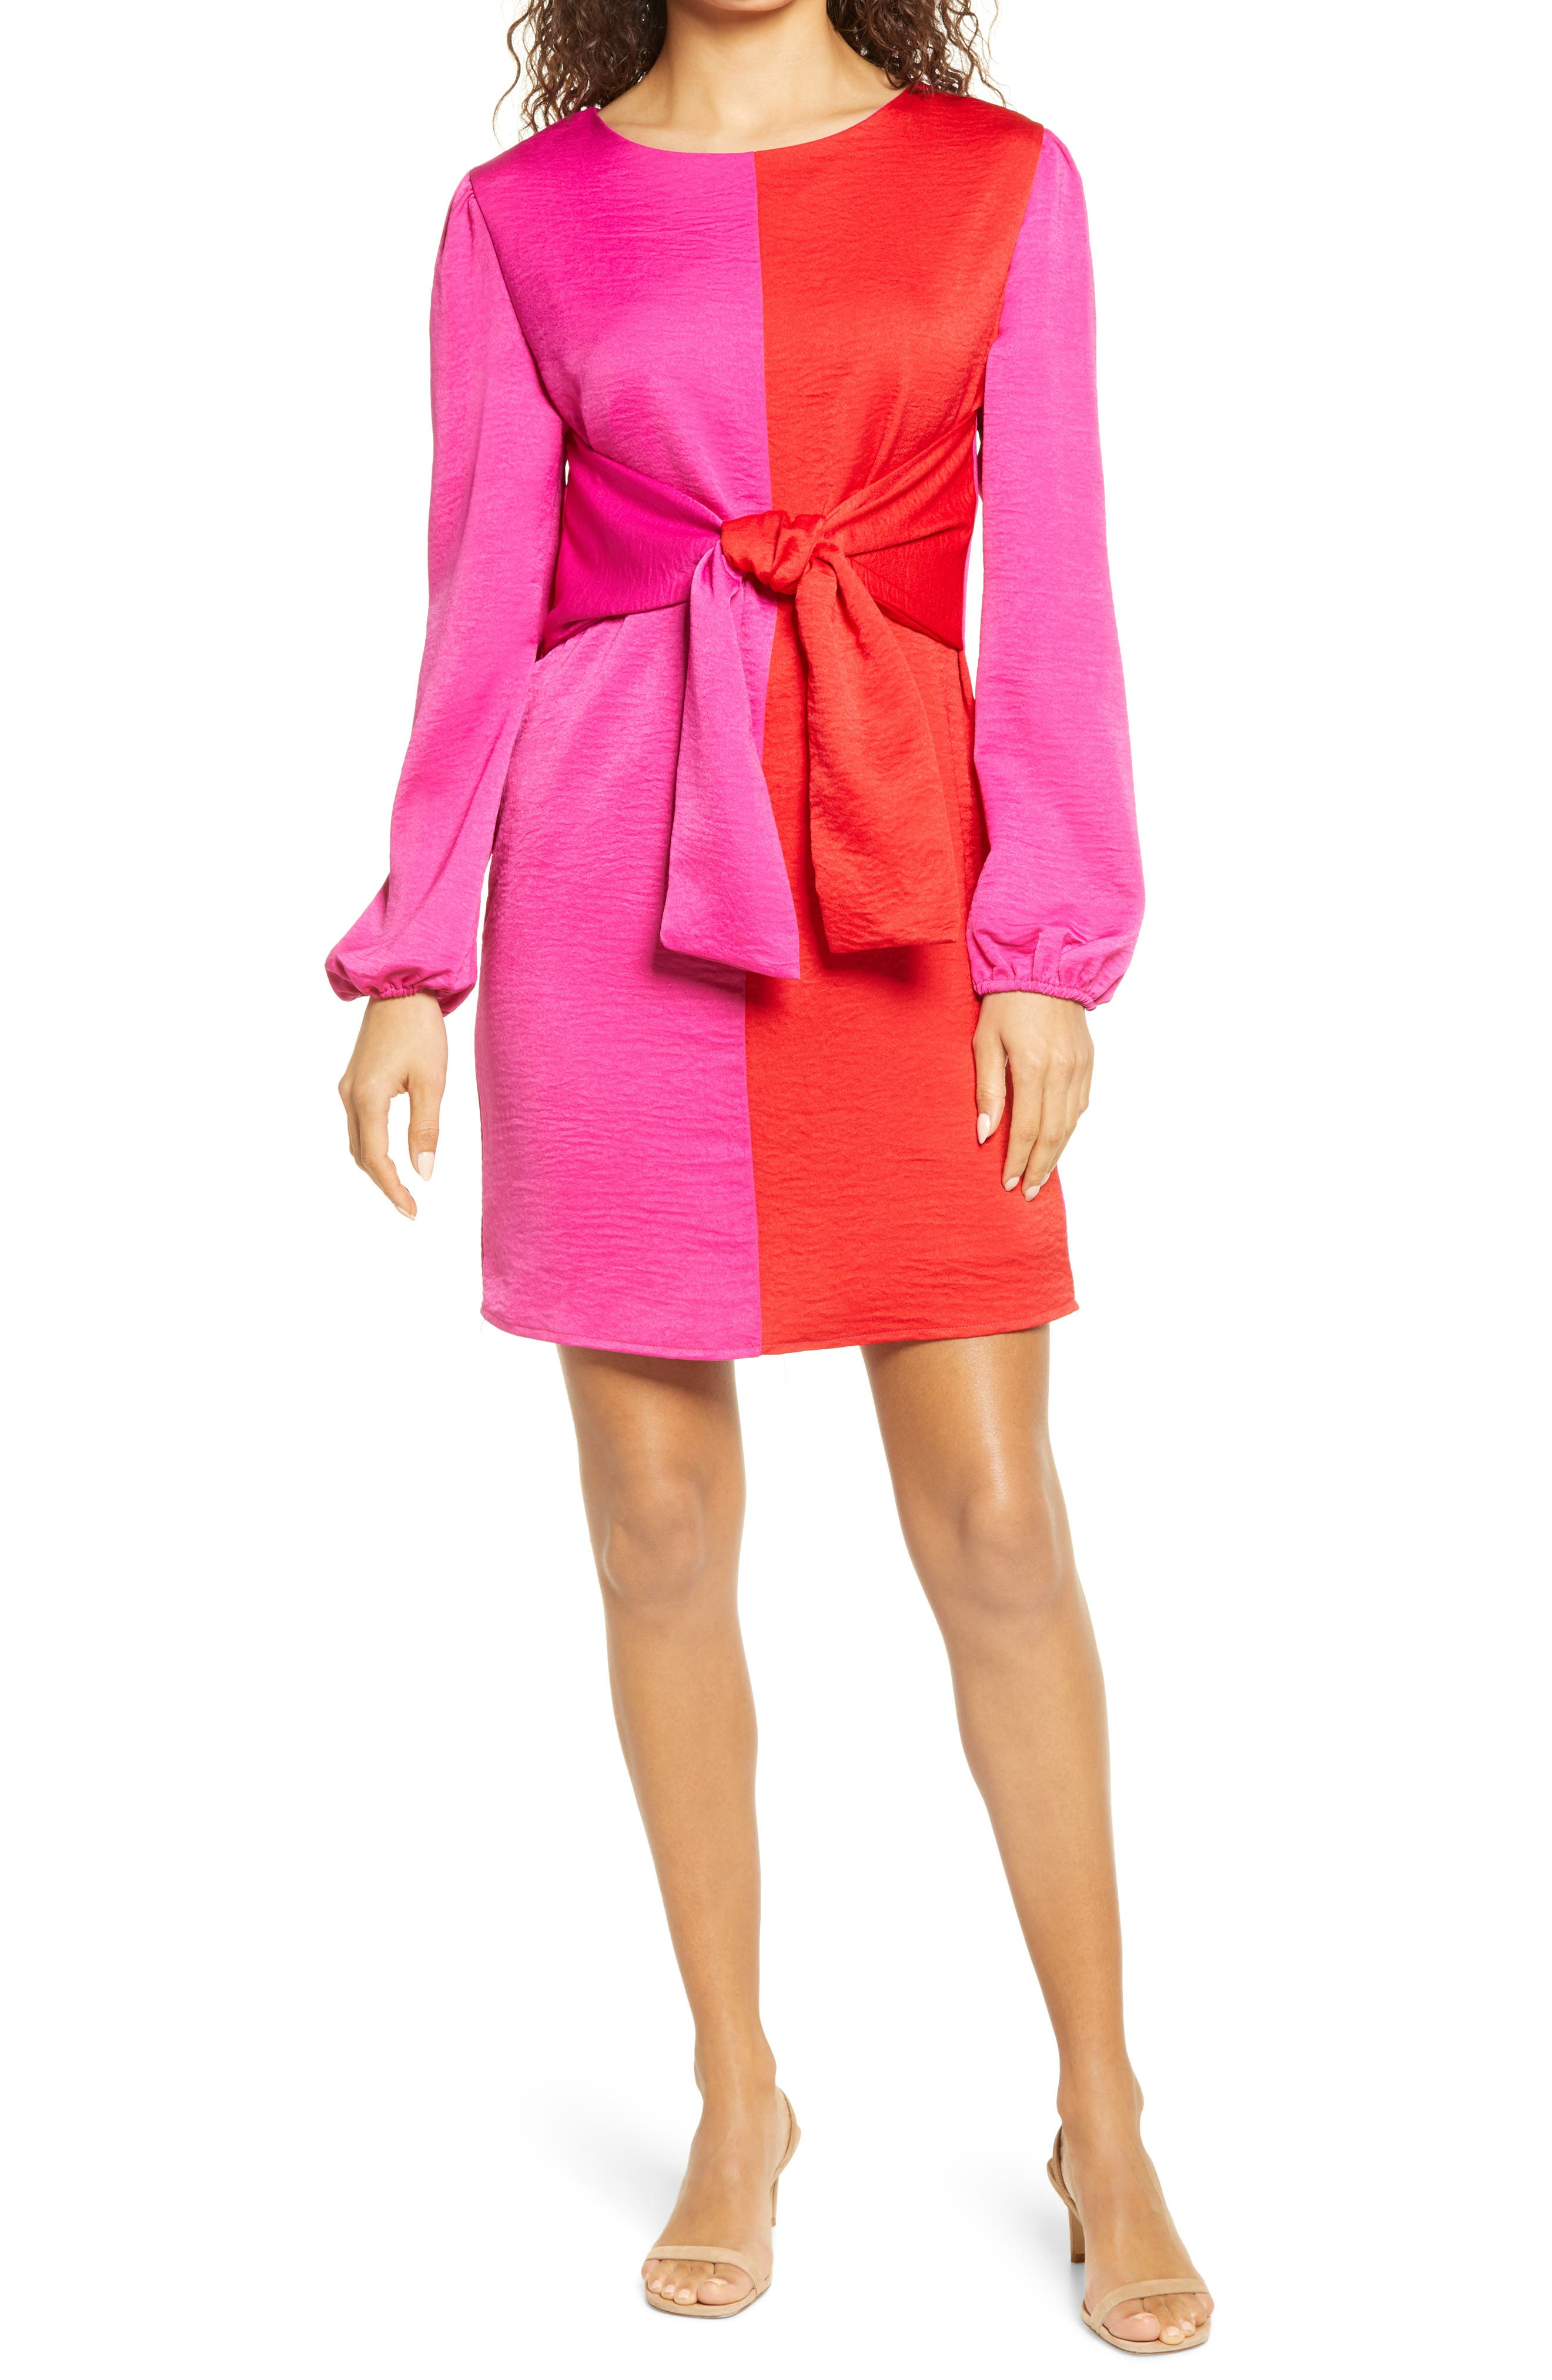 Colorblock Tie Waist Long Sleeve Dress